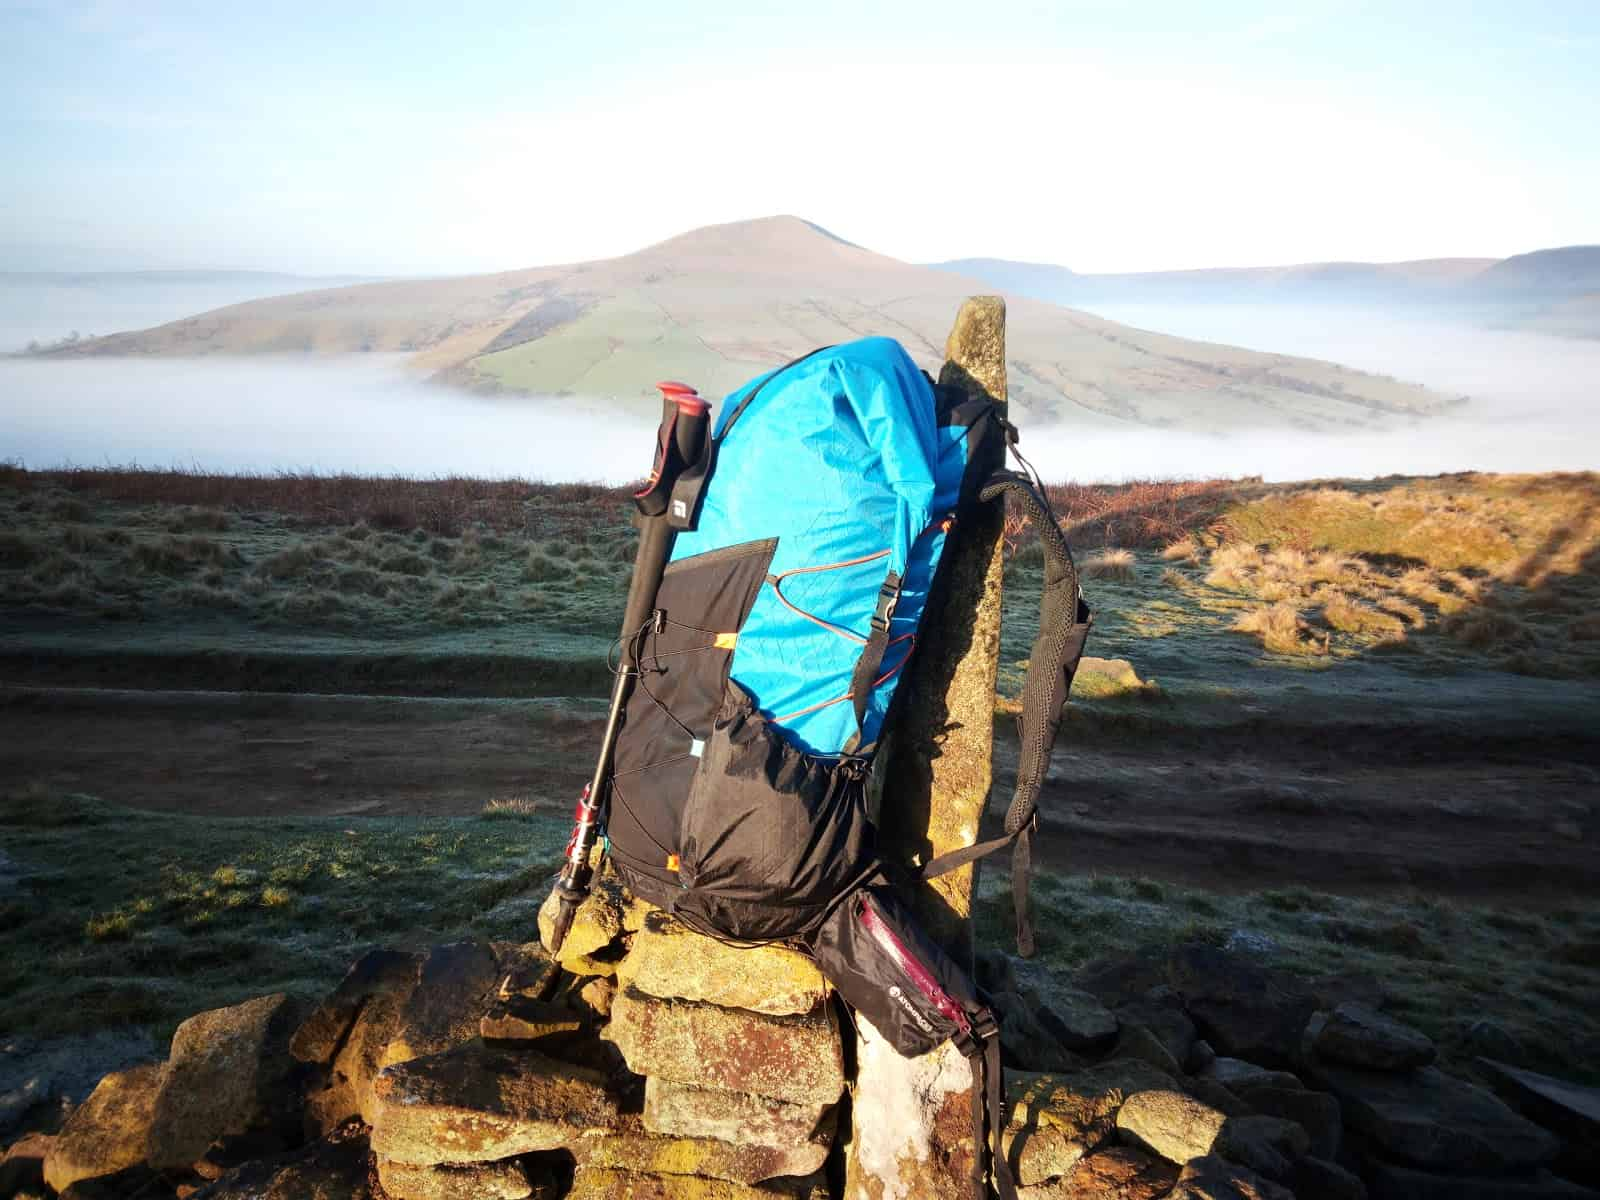 Derbyshire rucksack pictures etc 126